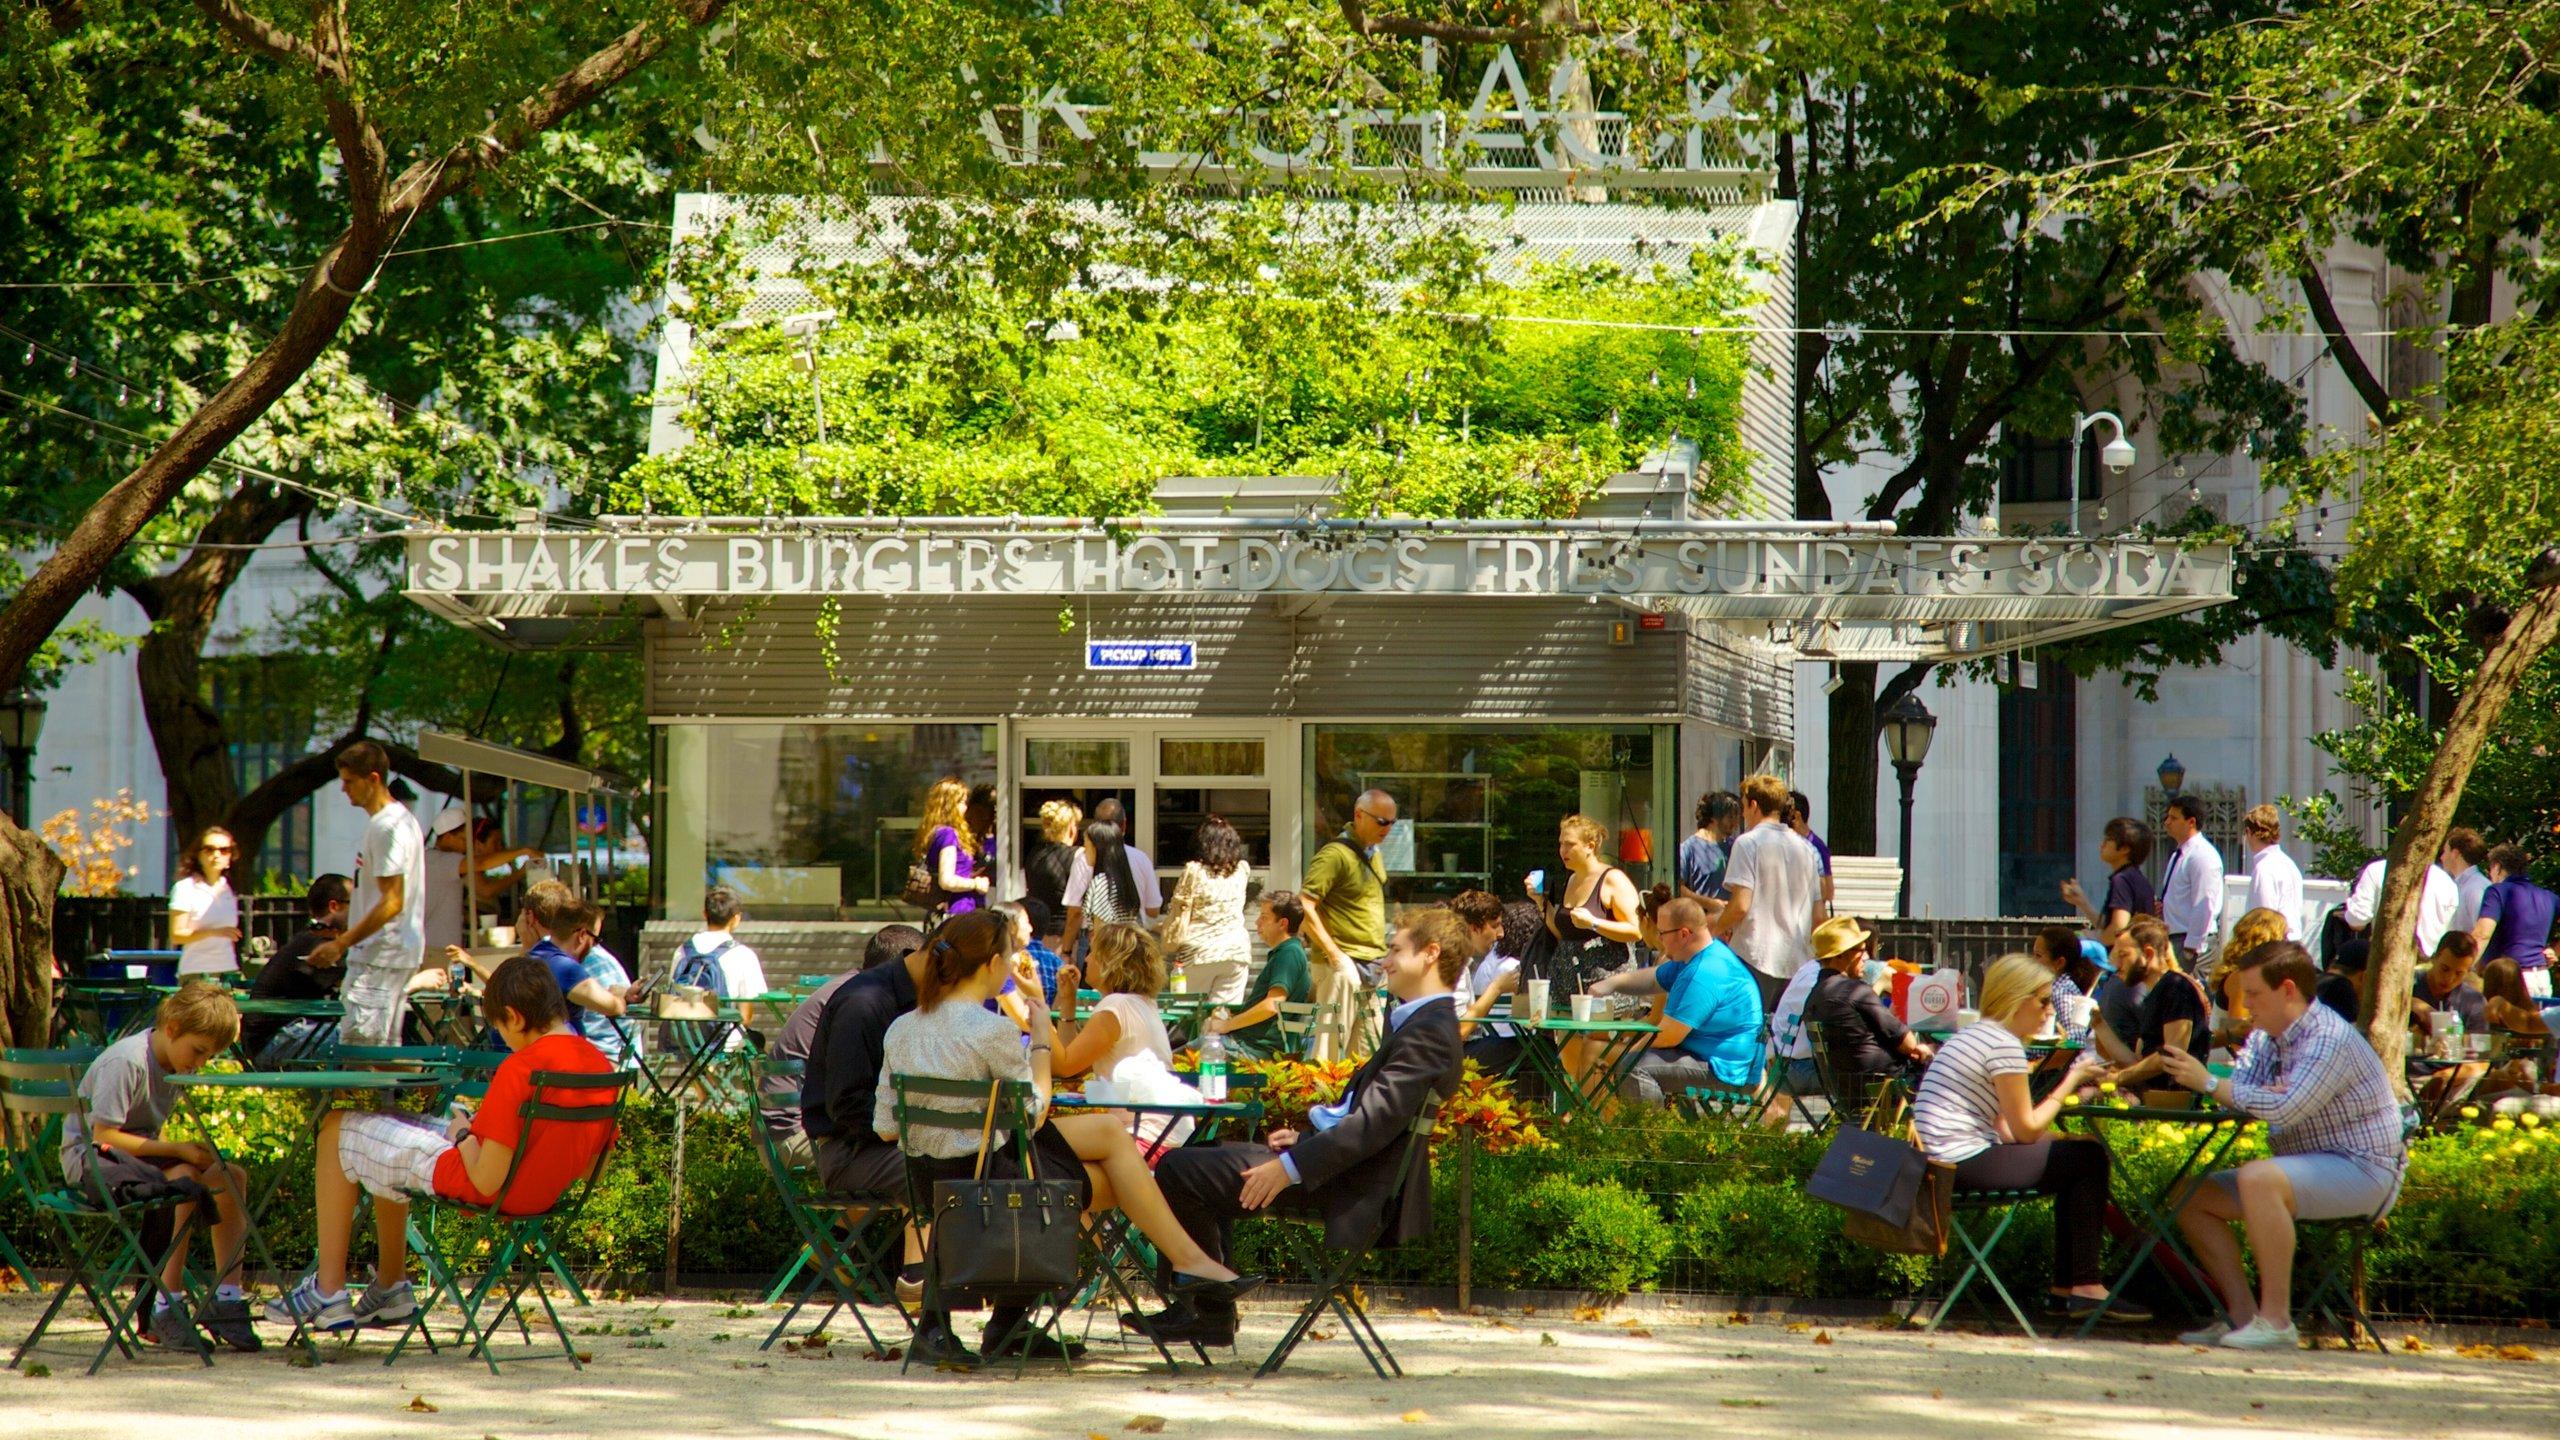 Flatiron District, New York, New York, United States of America